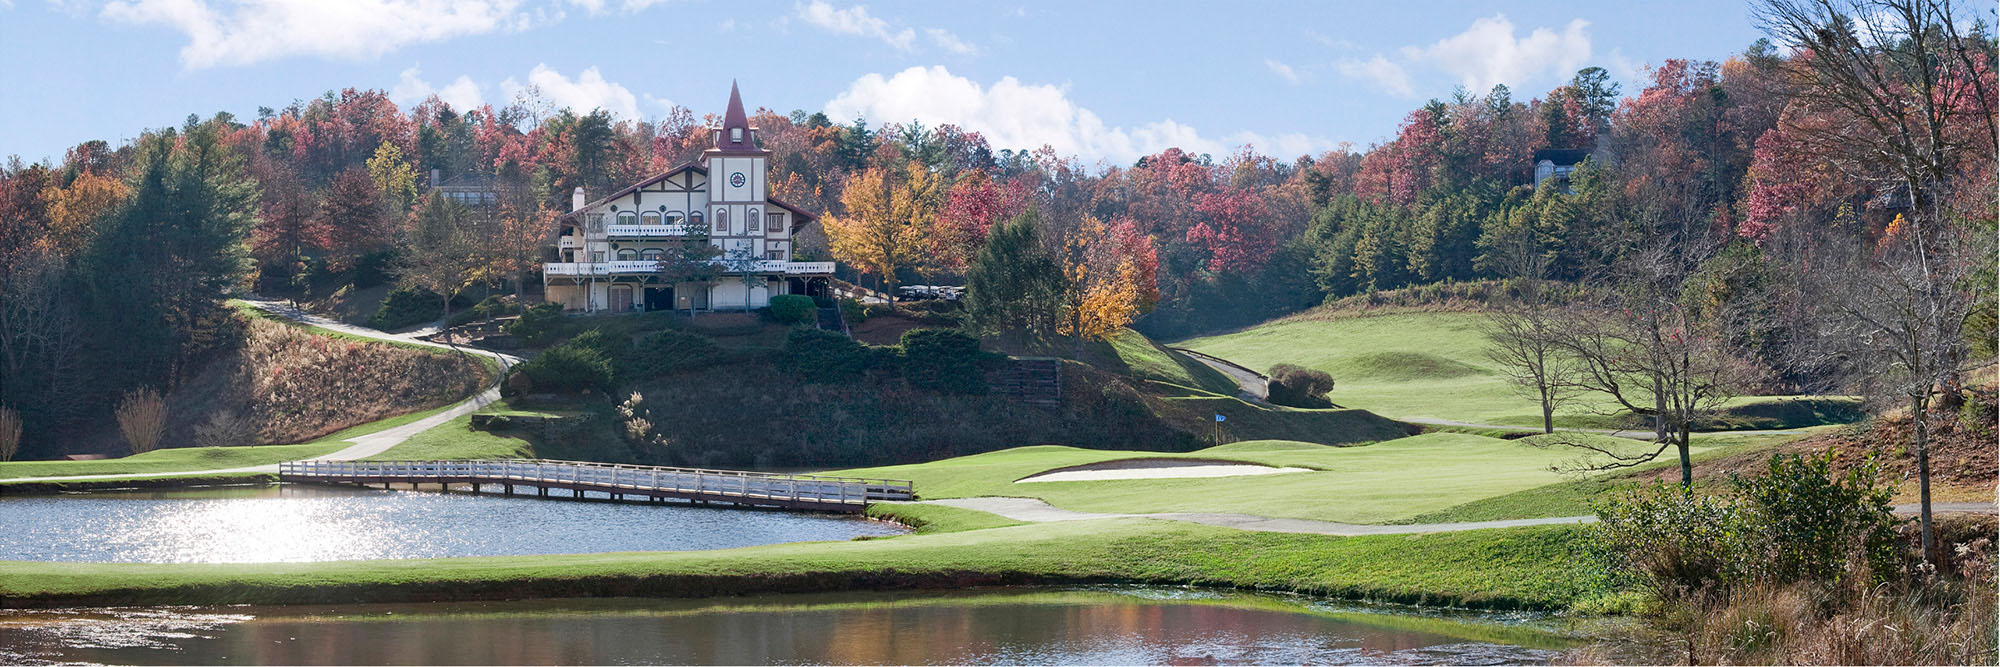 Golf Course Image - Innsbruck Resort & Golf Club No. 9